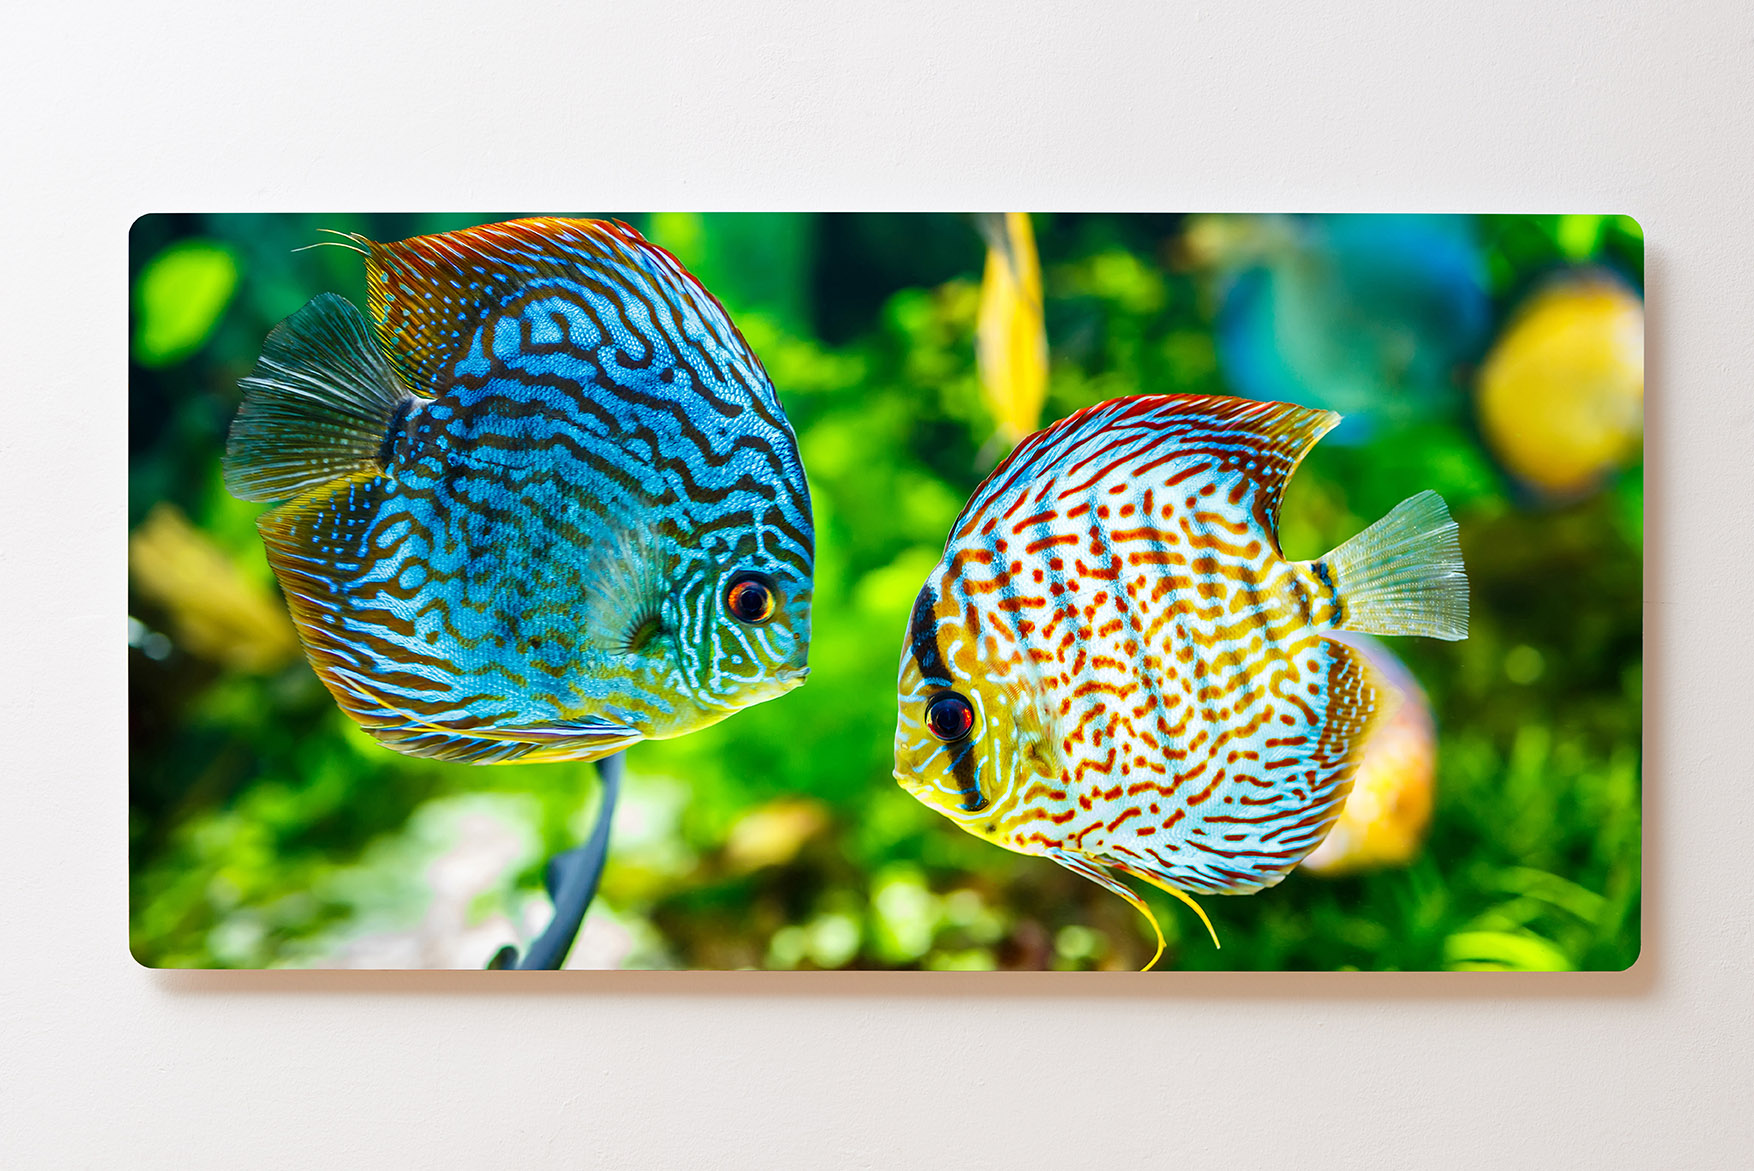 Magnettafel BACKLIGHT 120x60cm Motiv-Wandbild M105 Aquarium Diskus